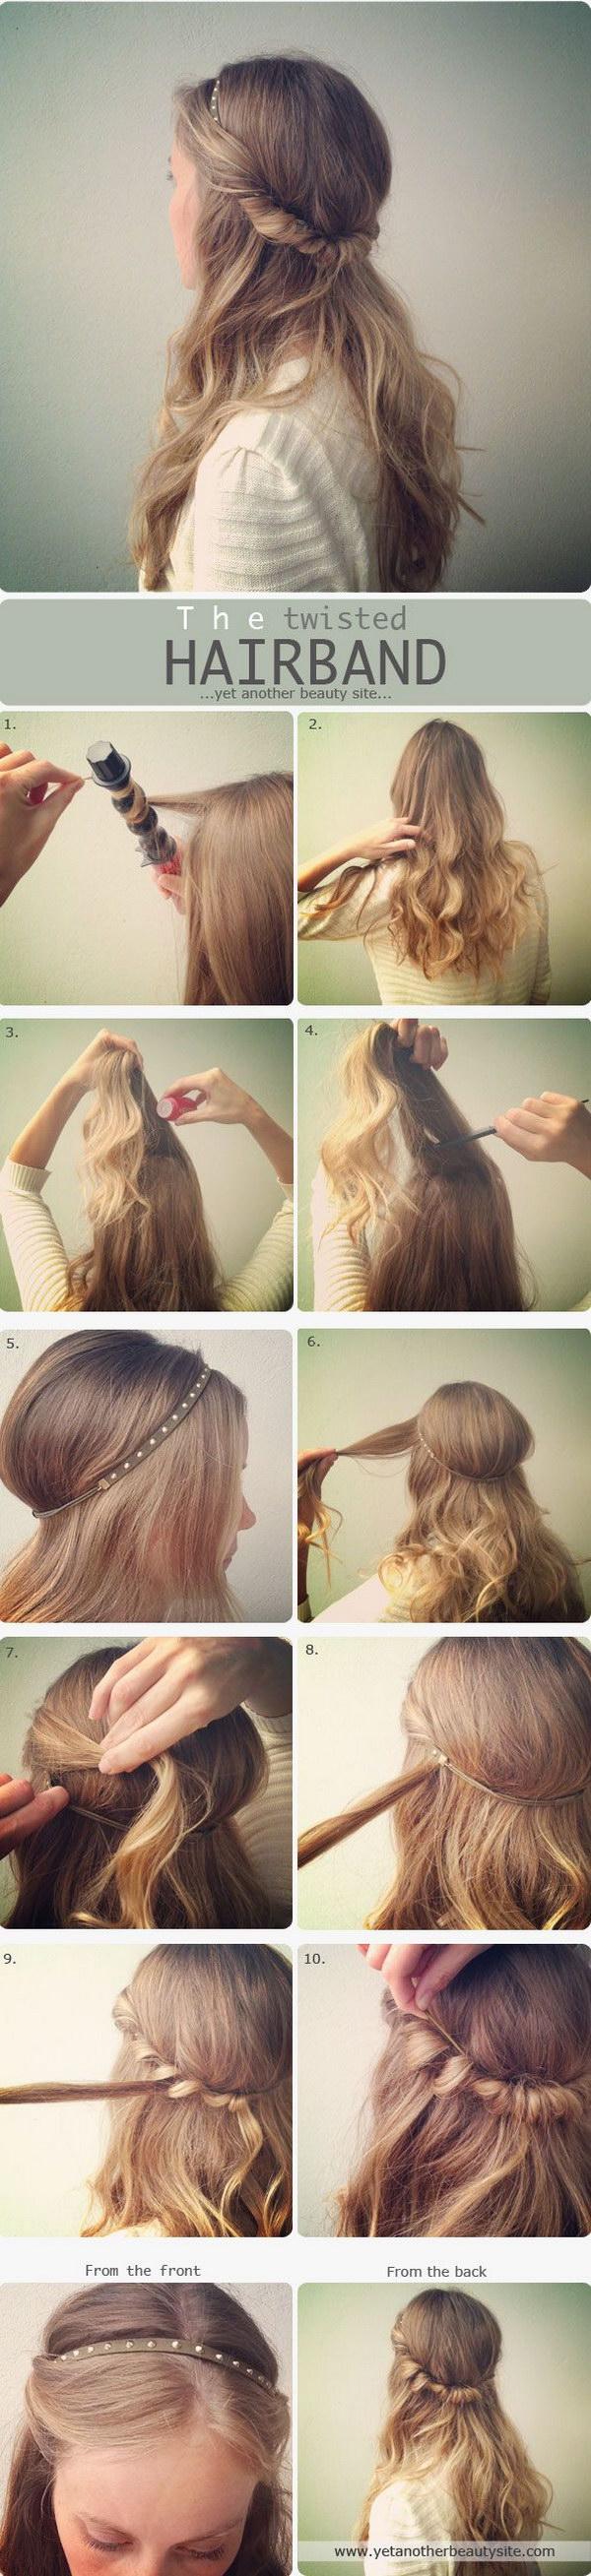 Pleasant 55 Stunning Half Up Half Down Hairstyles Styletic Short Hairstyles Gunalazisus